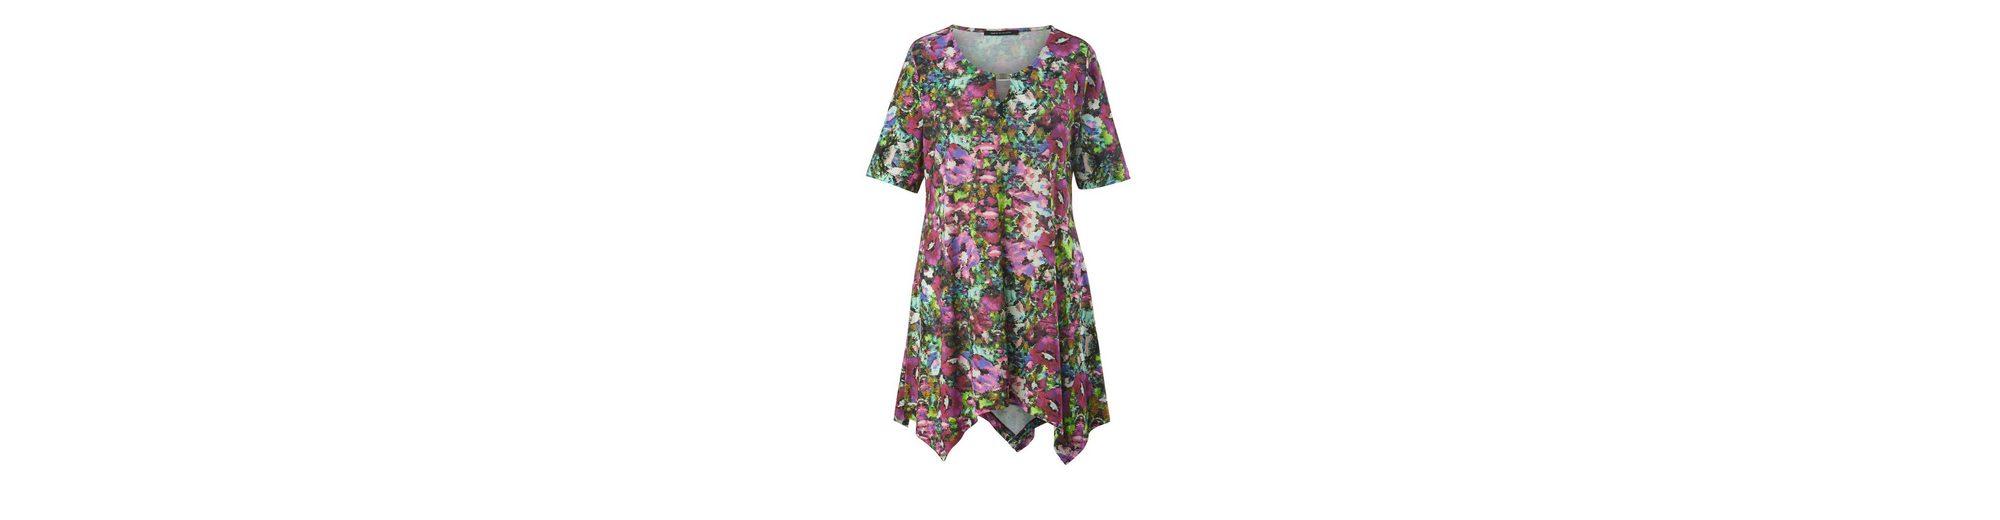 Sara Lindholm by Happy Size Jersey-Tunika mit Zipfelsaum Extrem Zum Verkauf YrLQsb31br